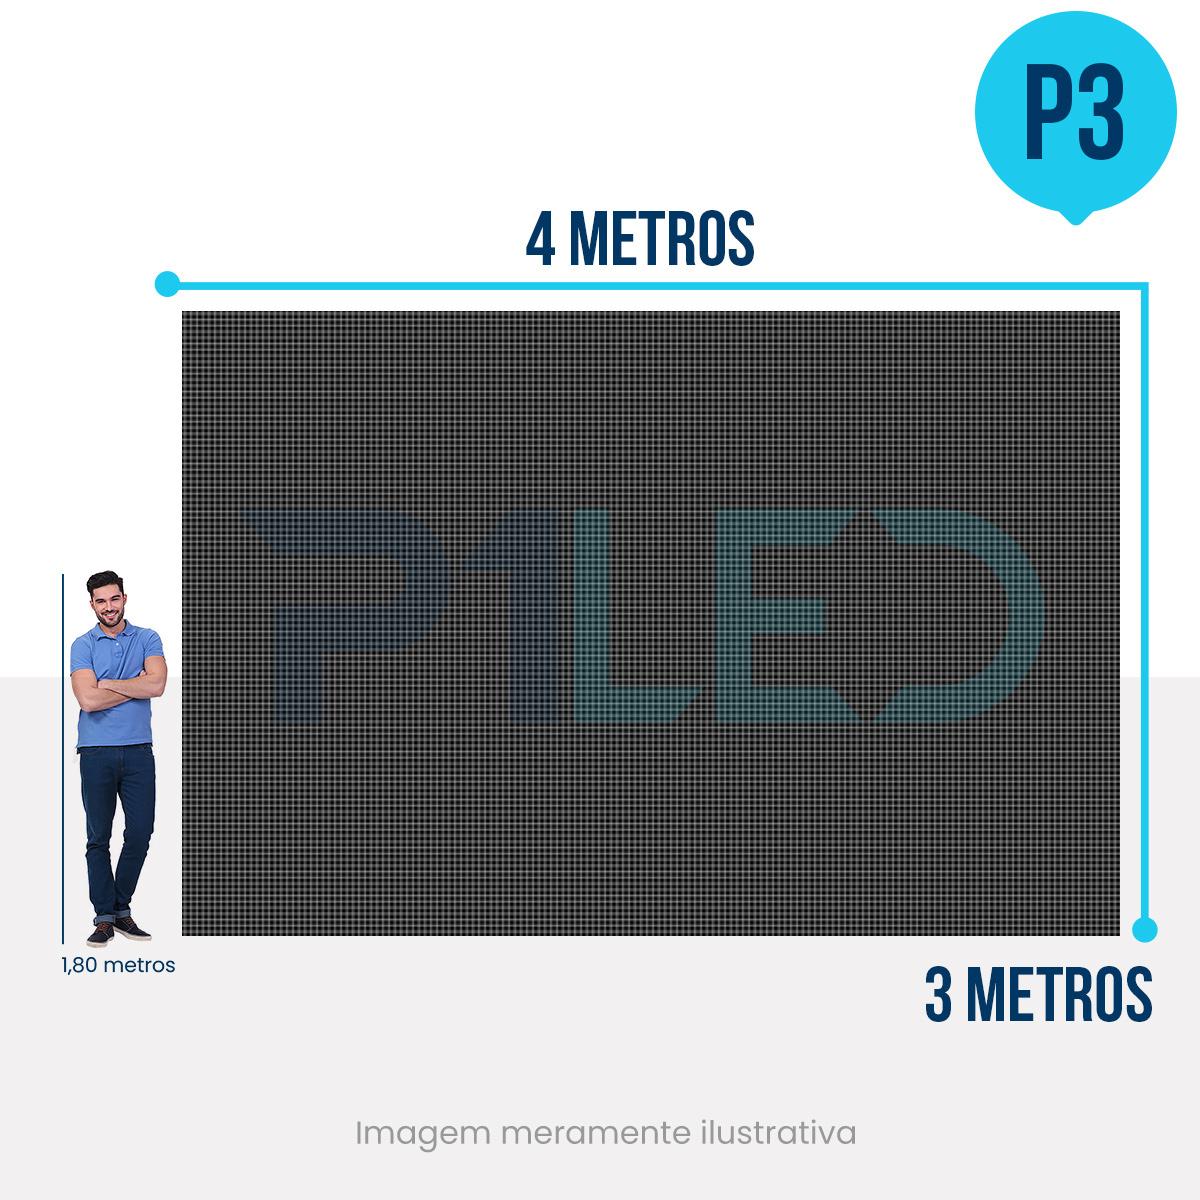 Painel de LED para Vitrine 4x3 - Telão P3 Outdoor  - Painel e Telão de LED - O Melhor Preço em Painel de LED | P1LED